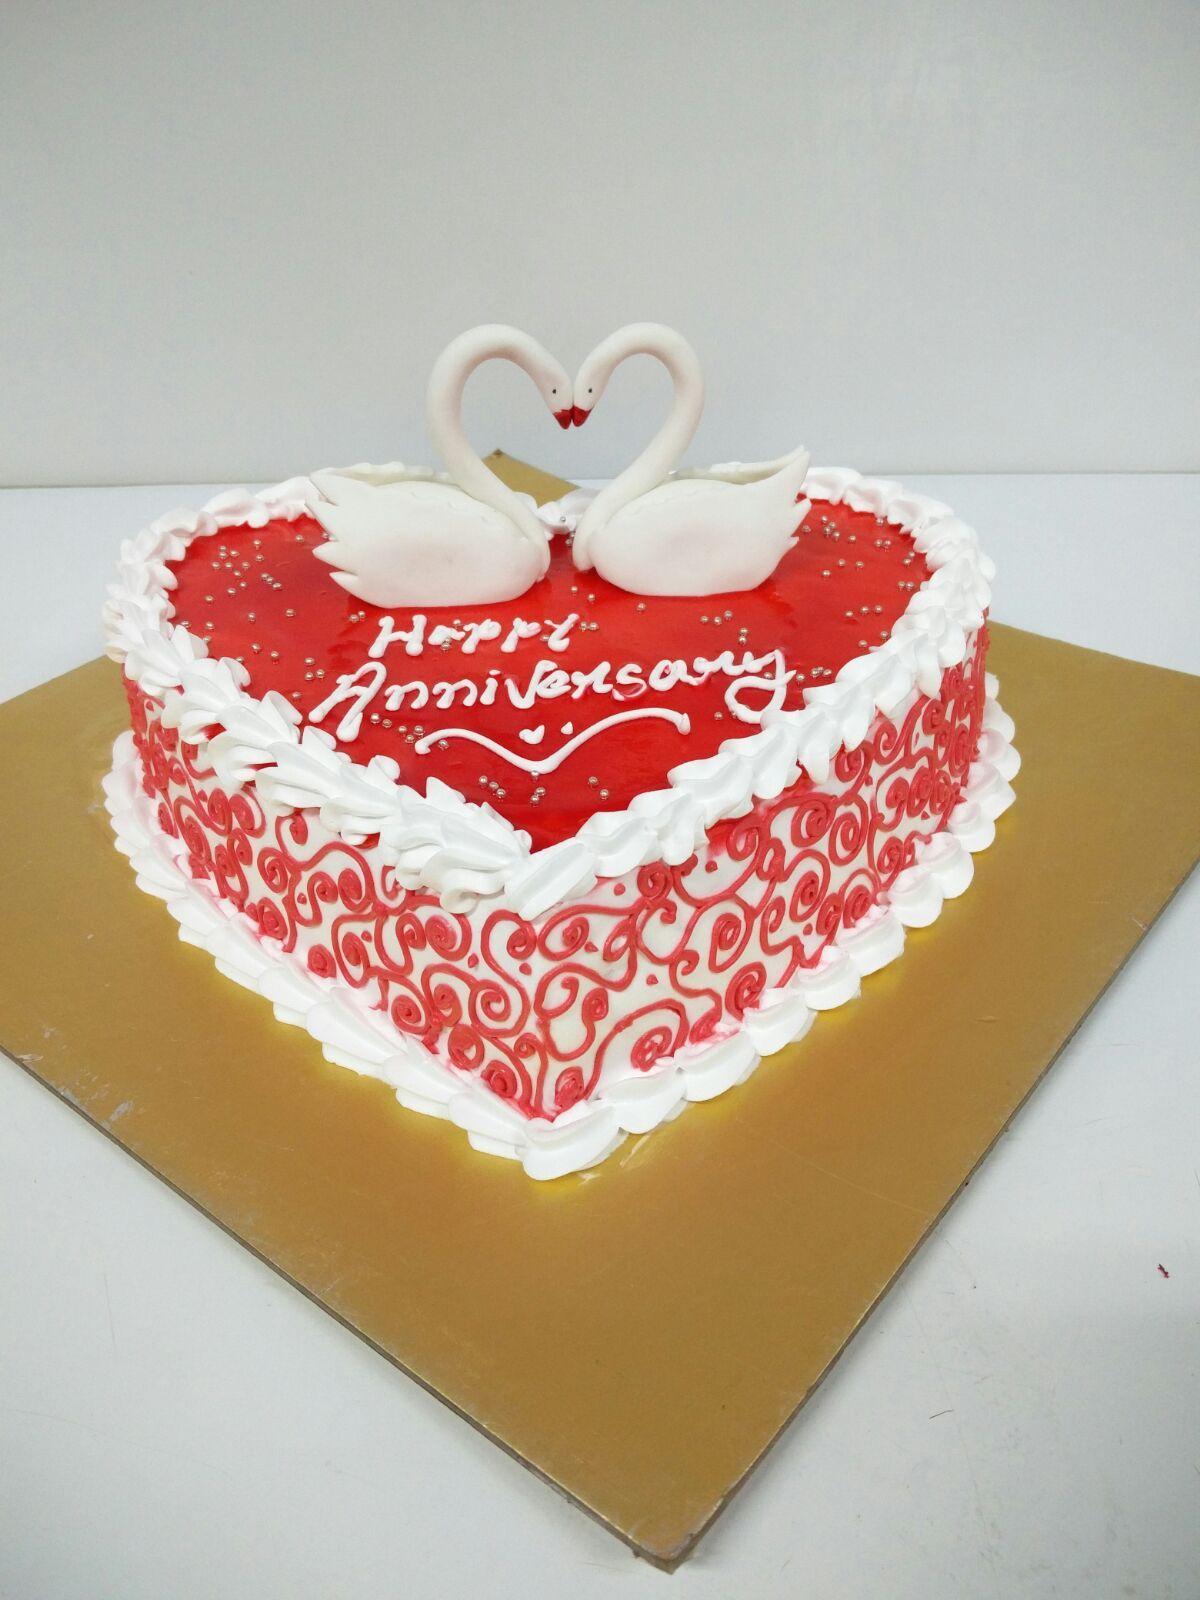 Order Cake Online In Udaipur Send Birthday Cake To Udaipur Order